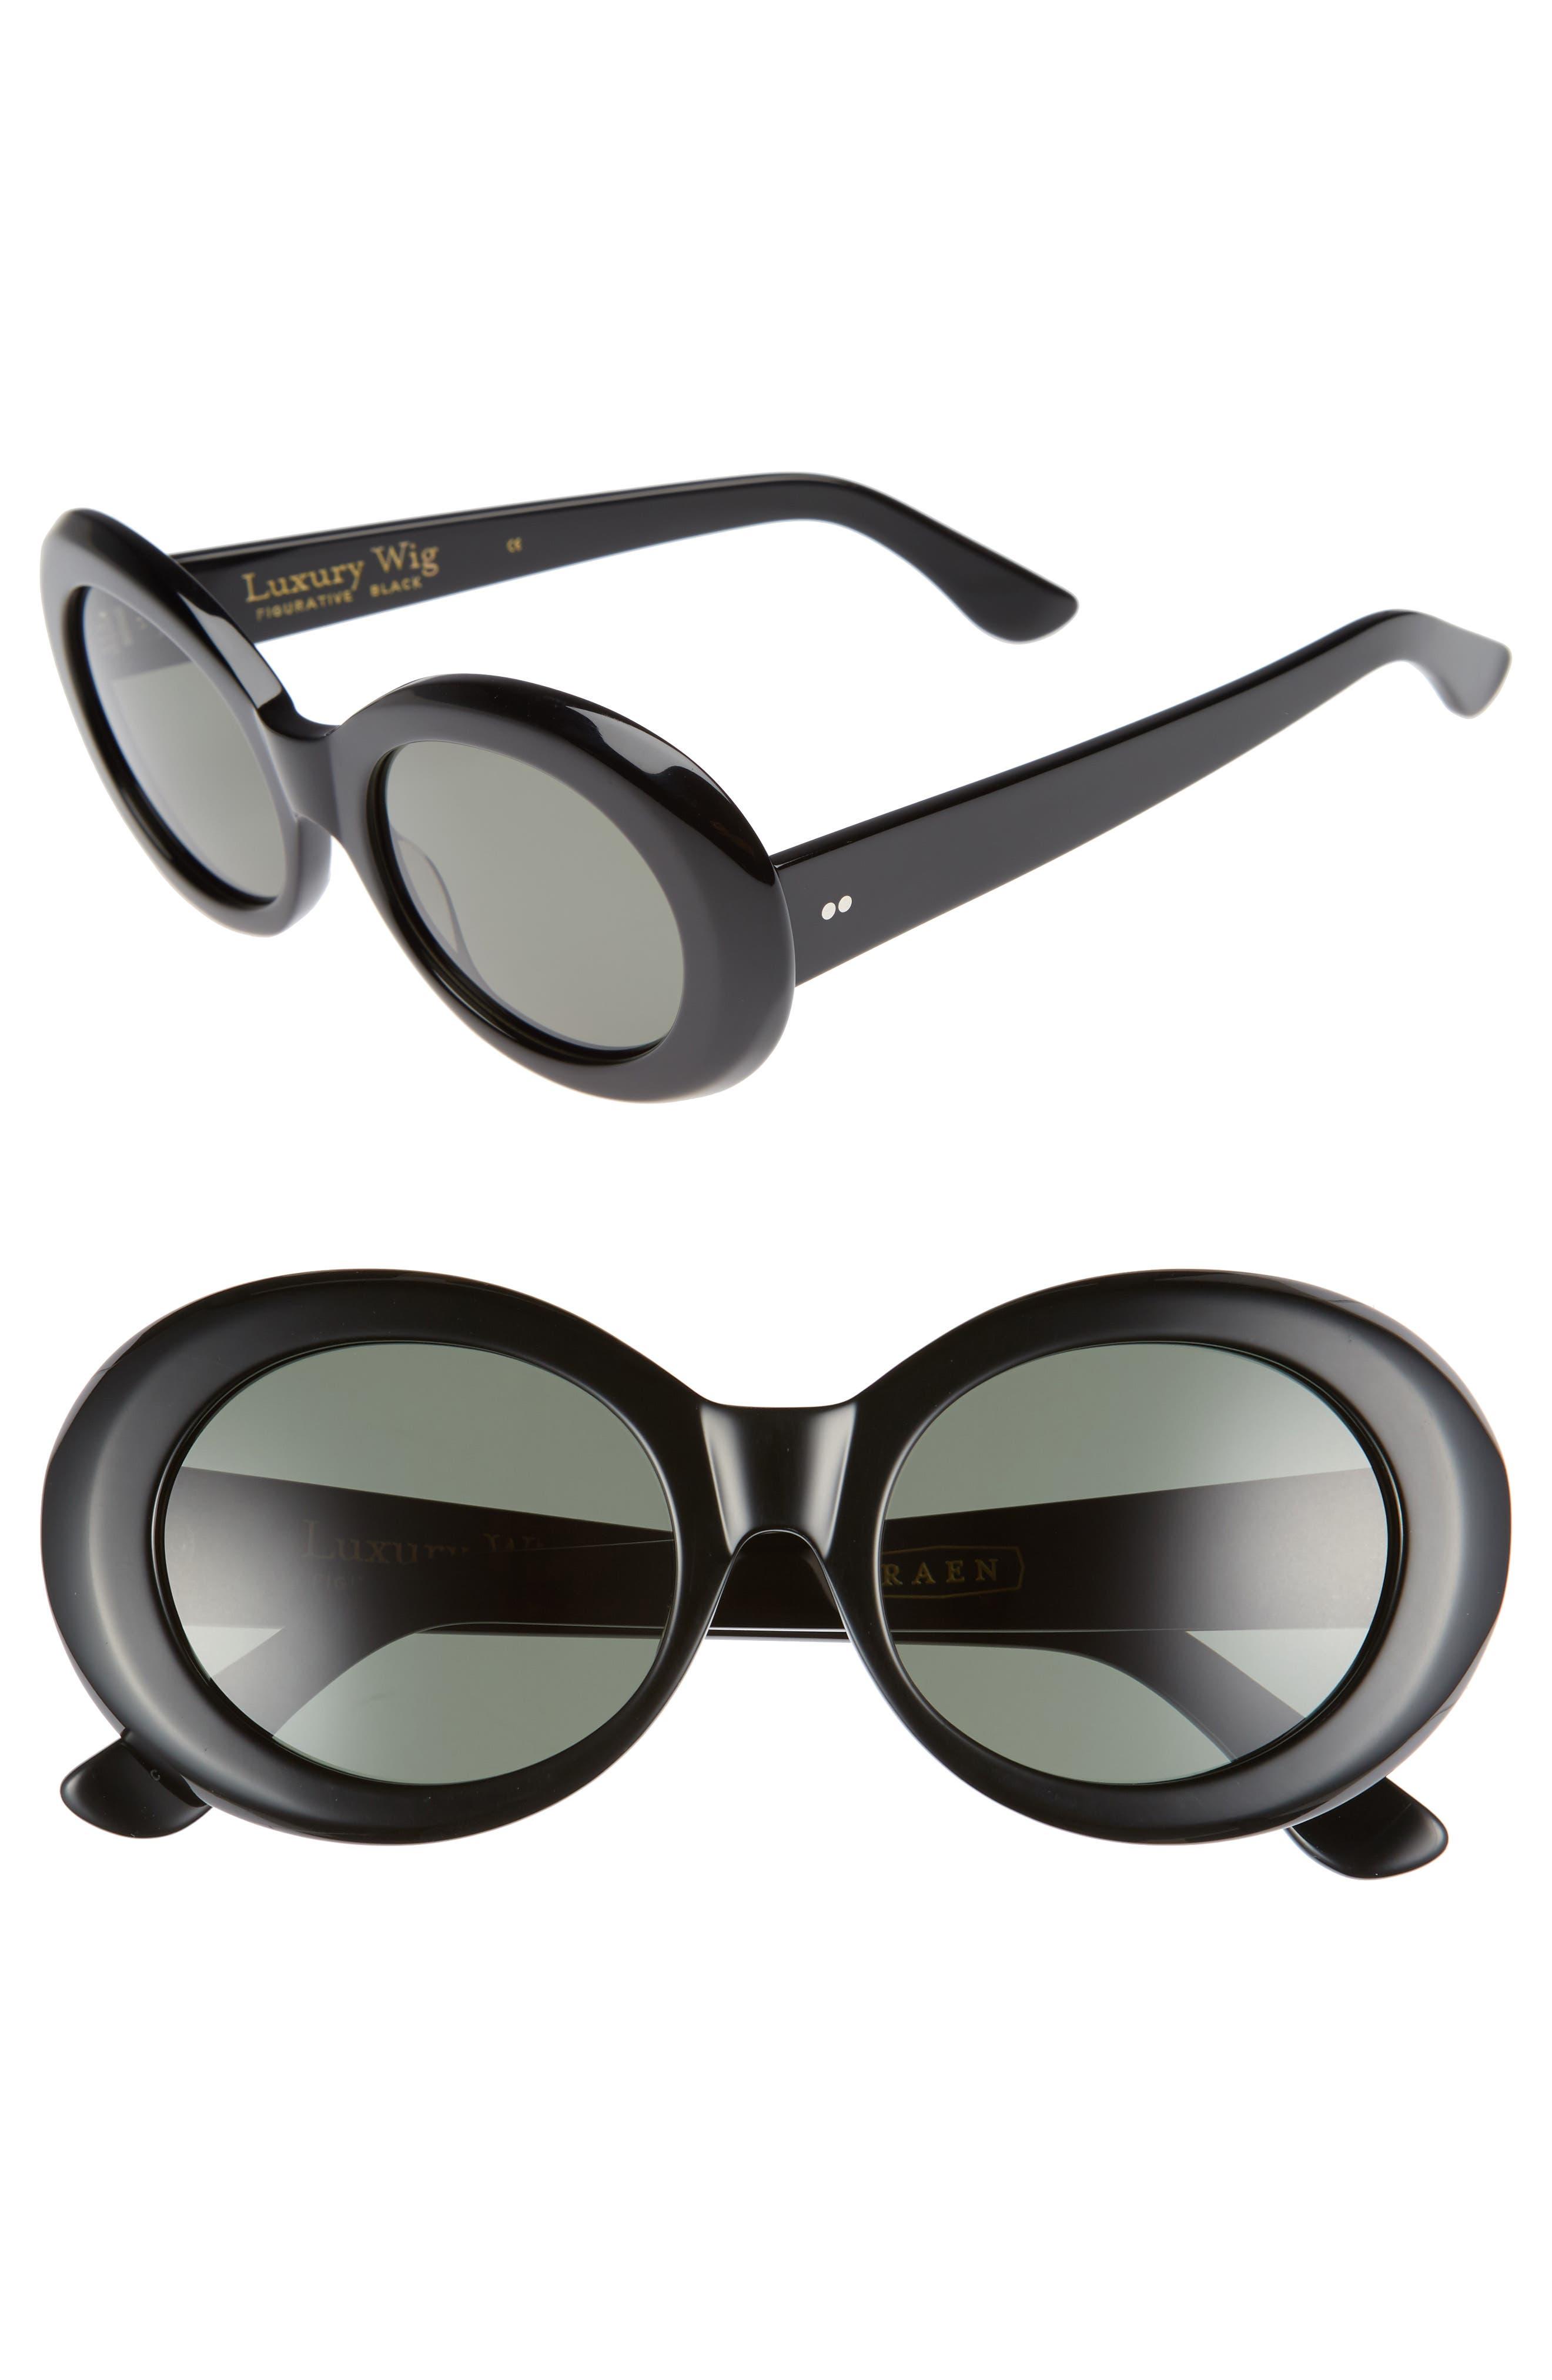 x Alex Knost Luxury Wig Figurative 53mm Sunglasses,                         Main,                         color, Black